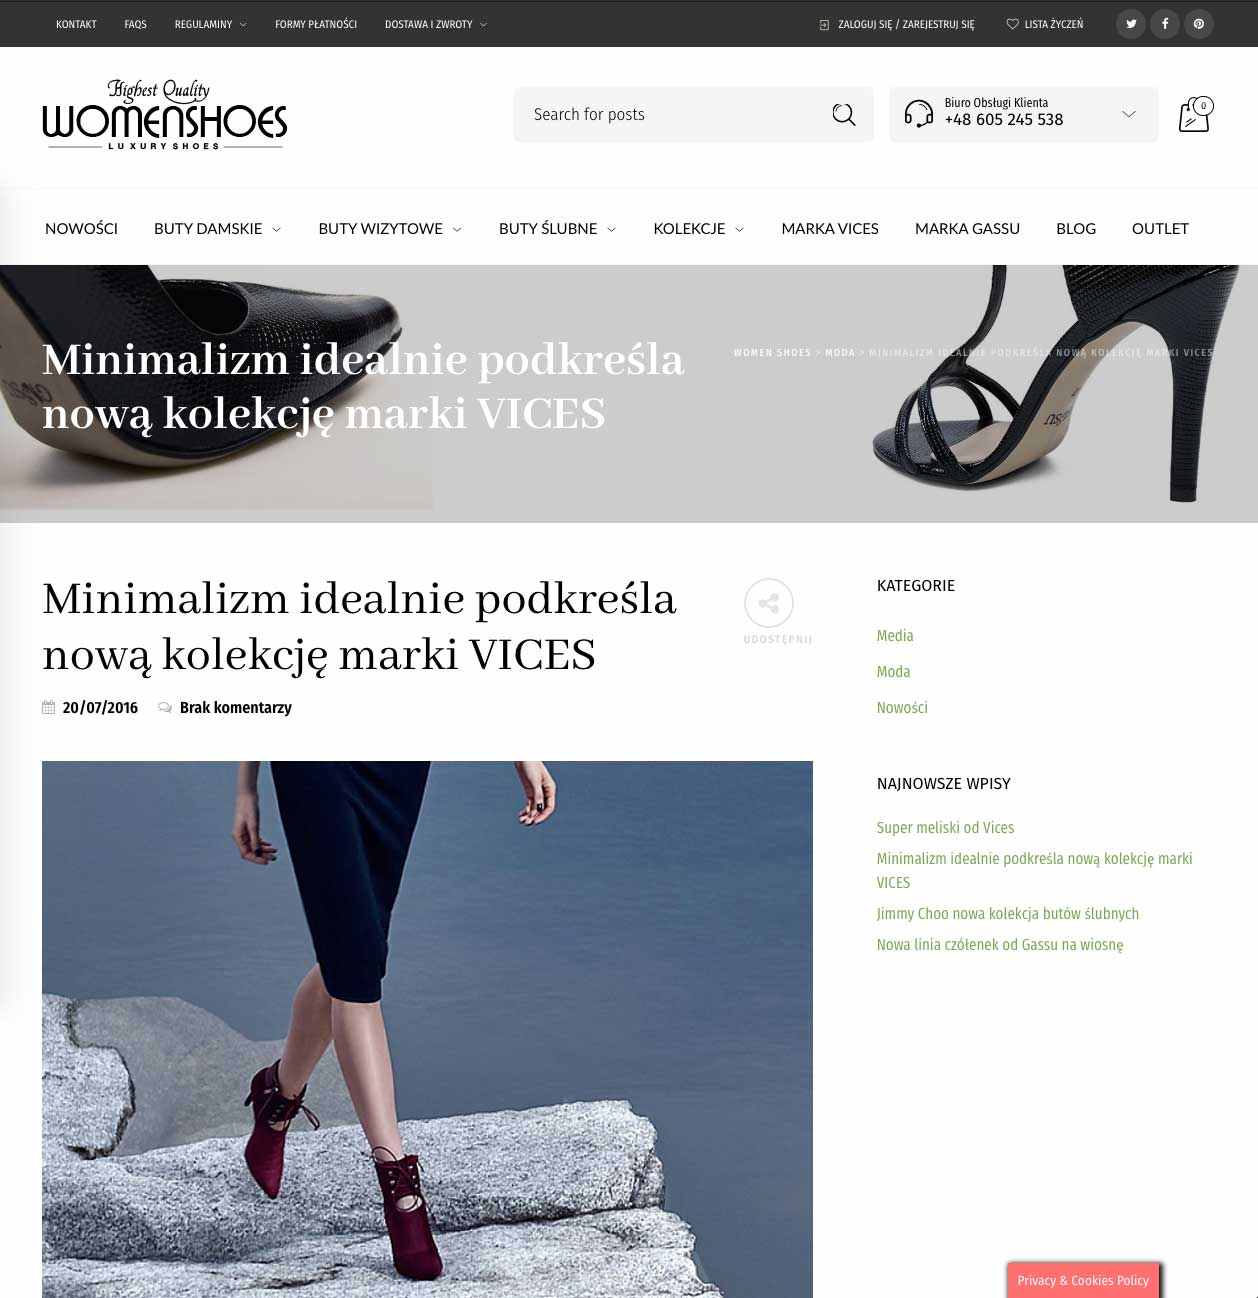 Realizacja WomenShoes 1